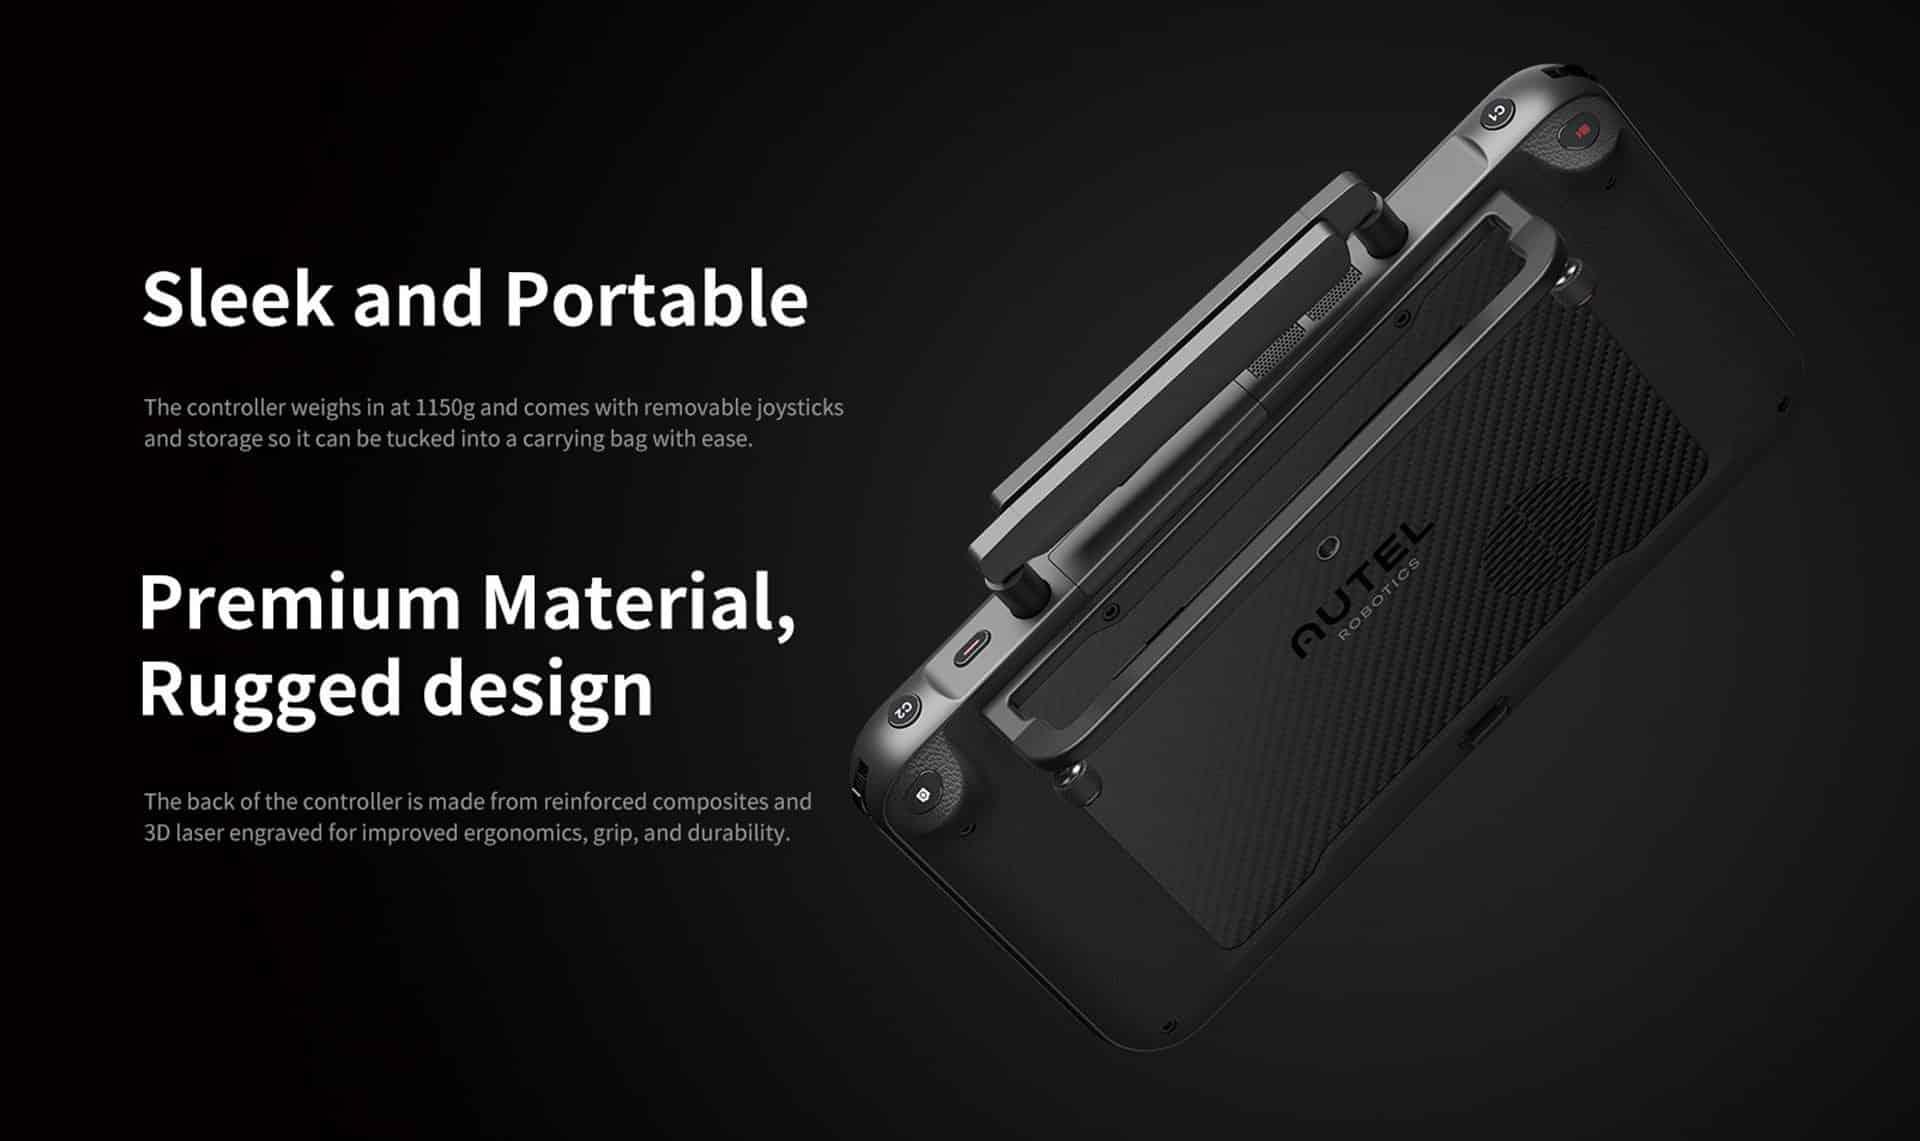 Autel-robotics-smart-controller-porta-portable-autelpilot